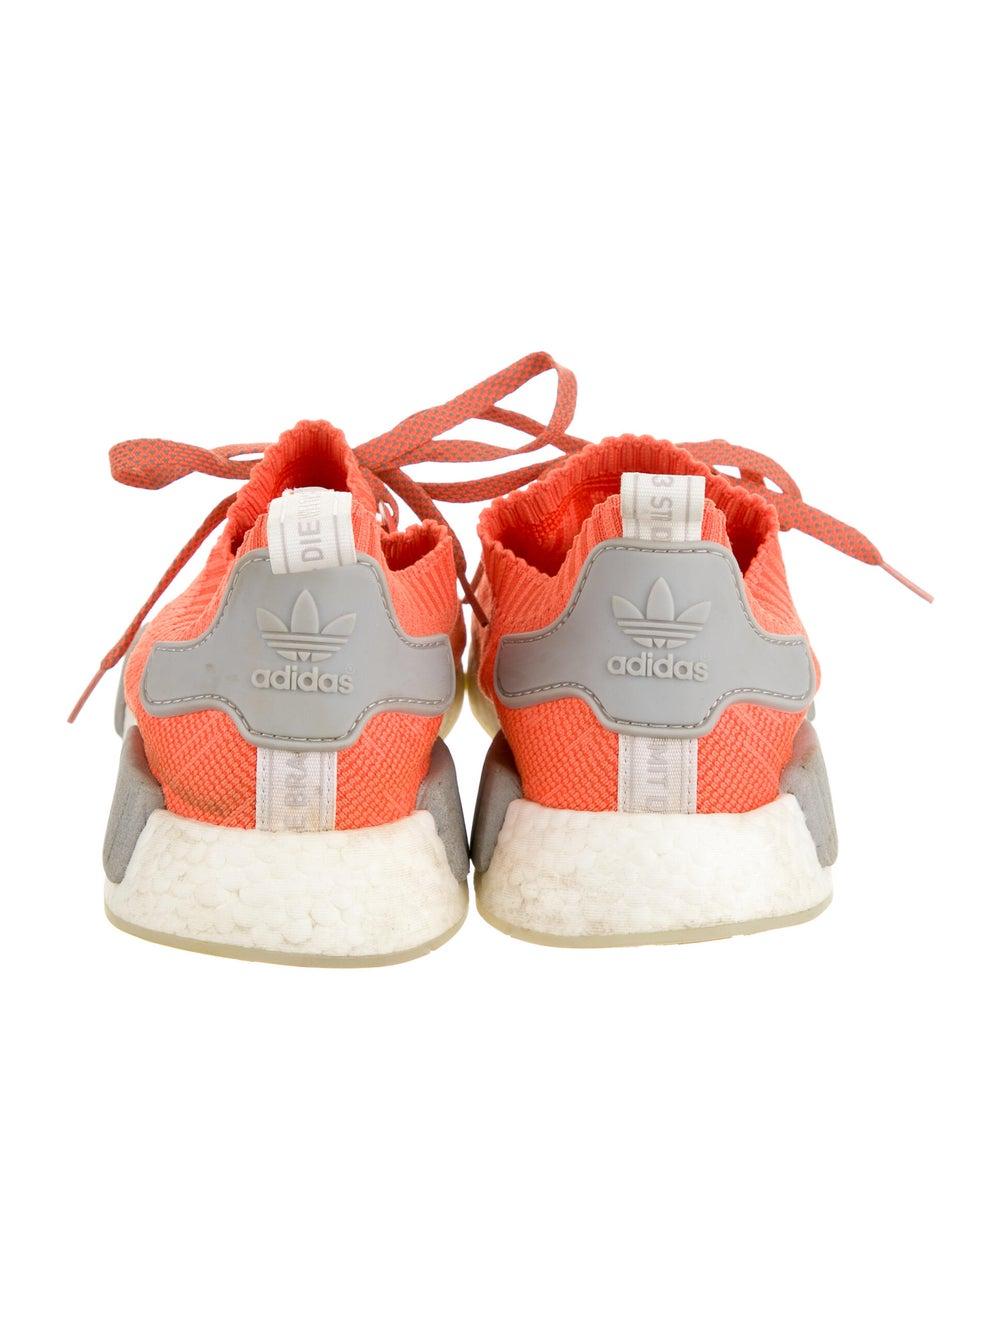 Adidas Athletic Sneakers Orange - image 4